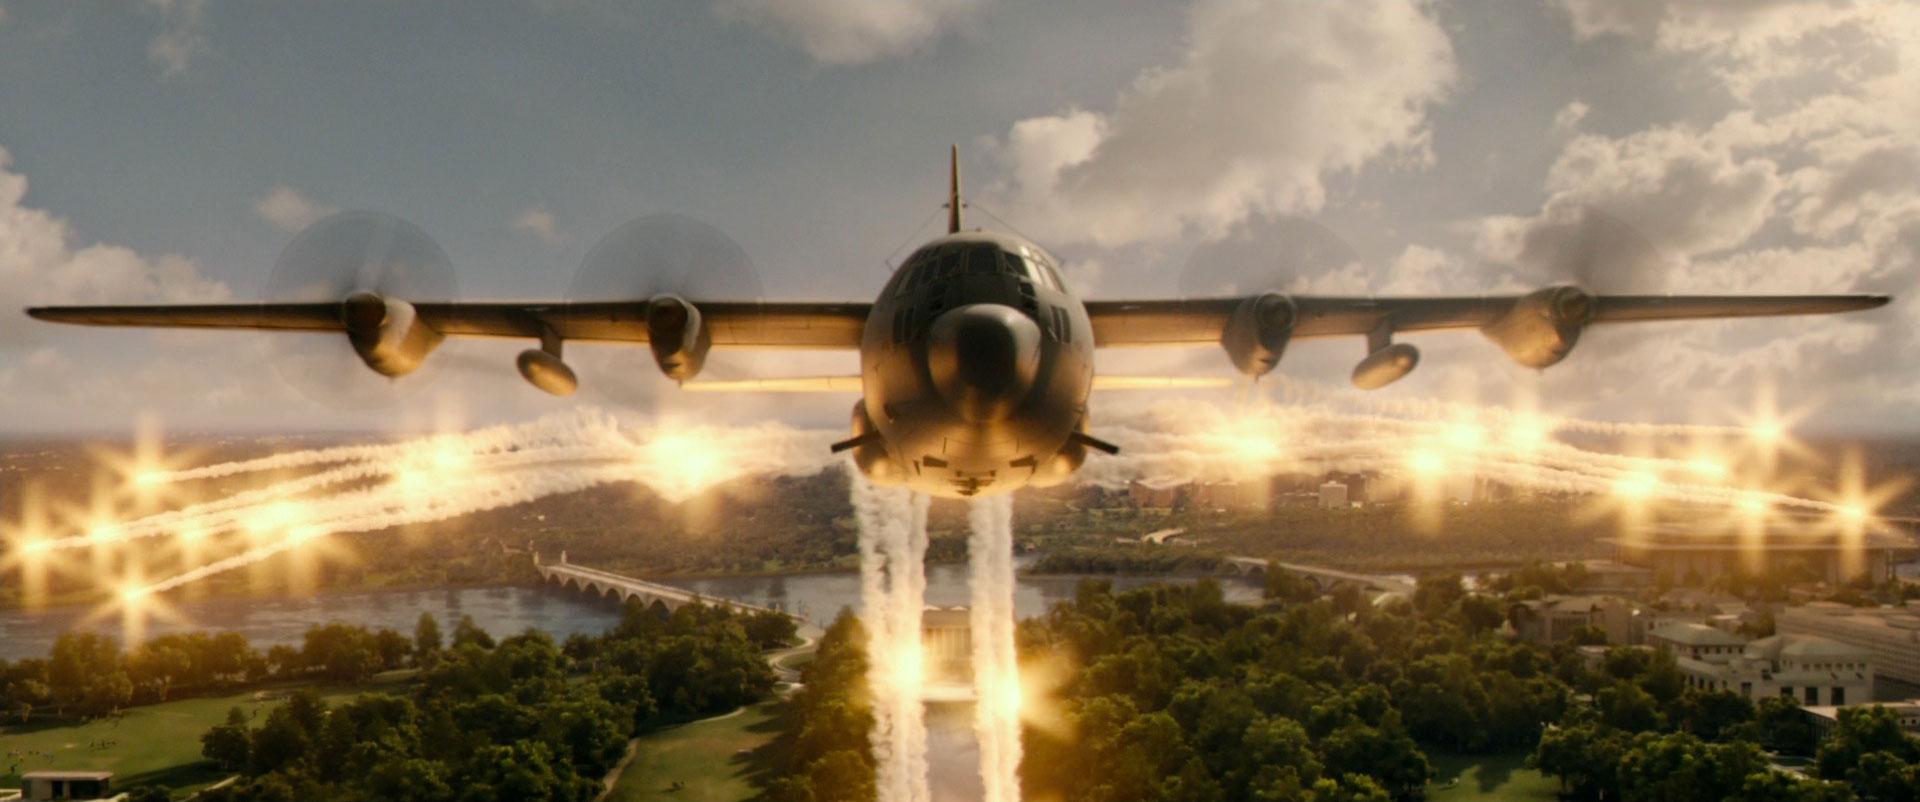 C-130 Hercules | Olympus Has Fallen Wiki | Fandom